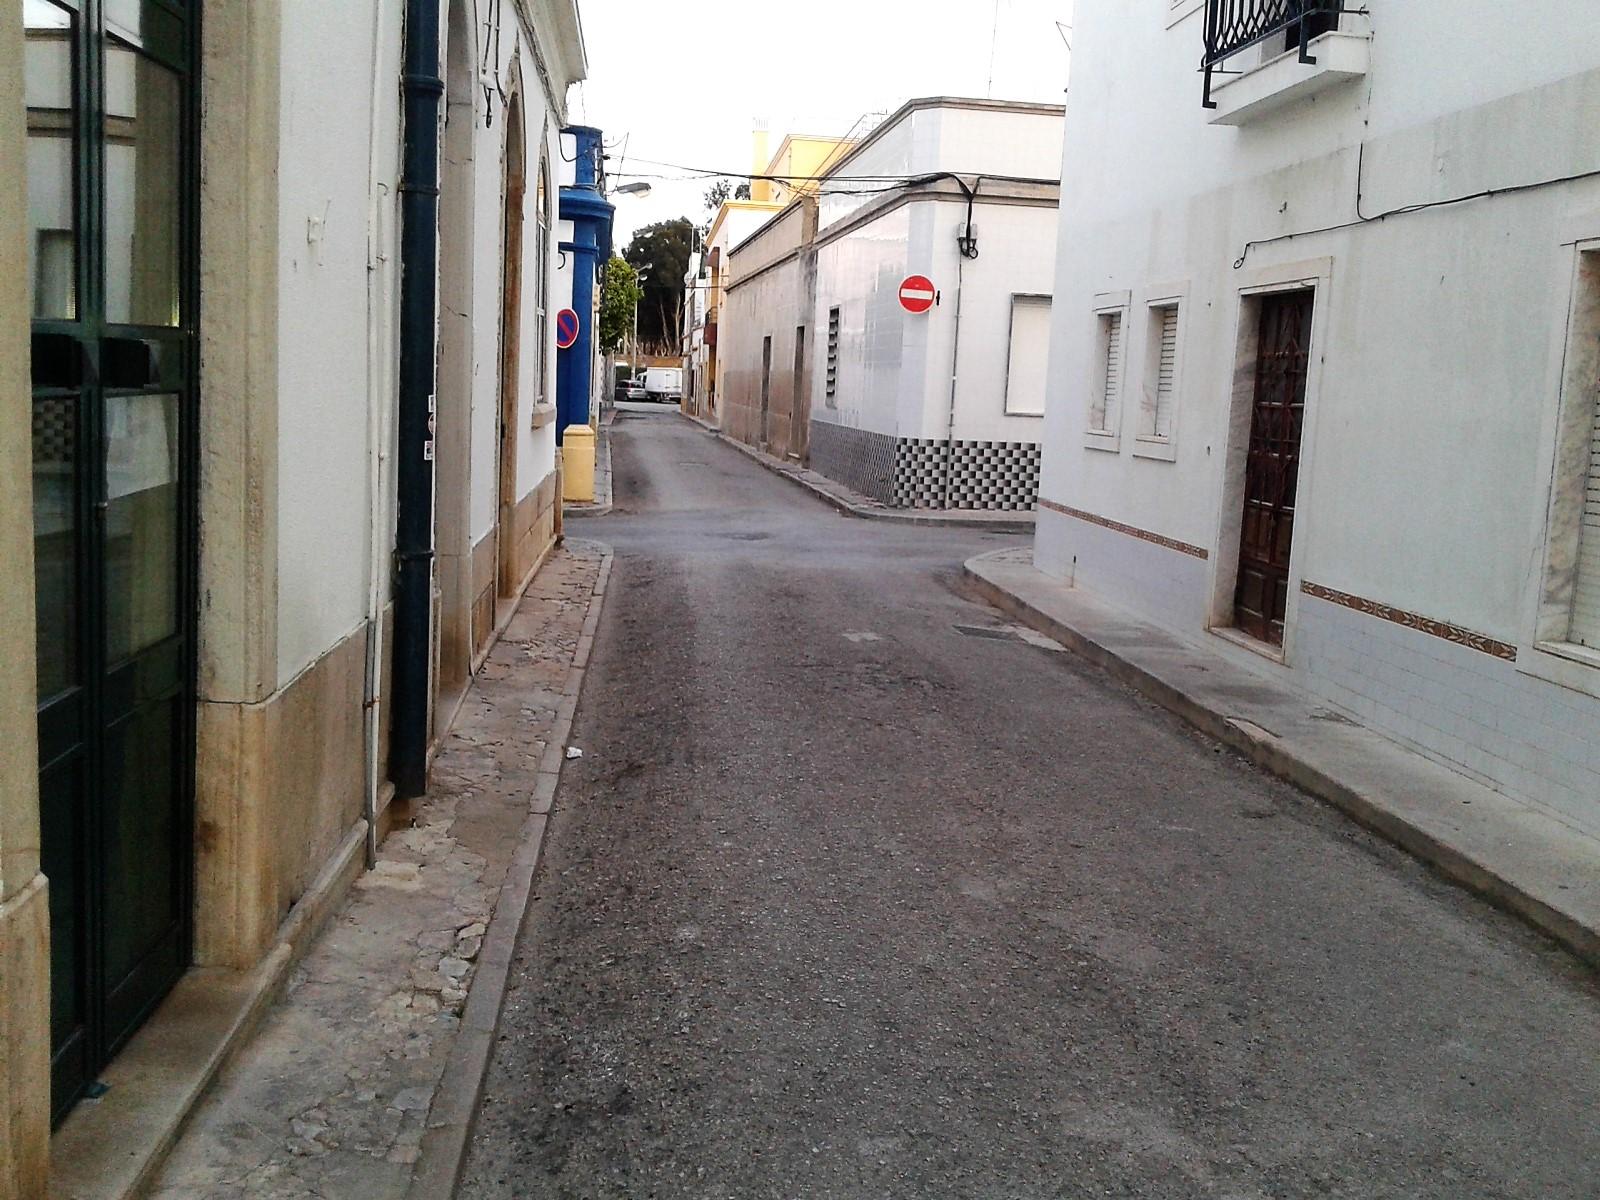 Holiday apartments and villas for rent, CASA NEUZA in Fuzeta, Portugal Algarve, REF_IMG_4092_4105